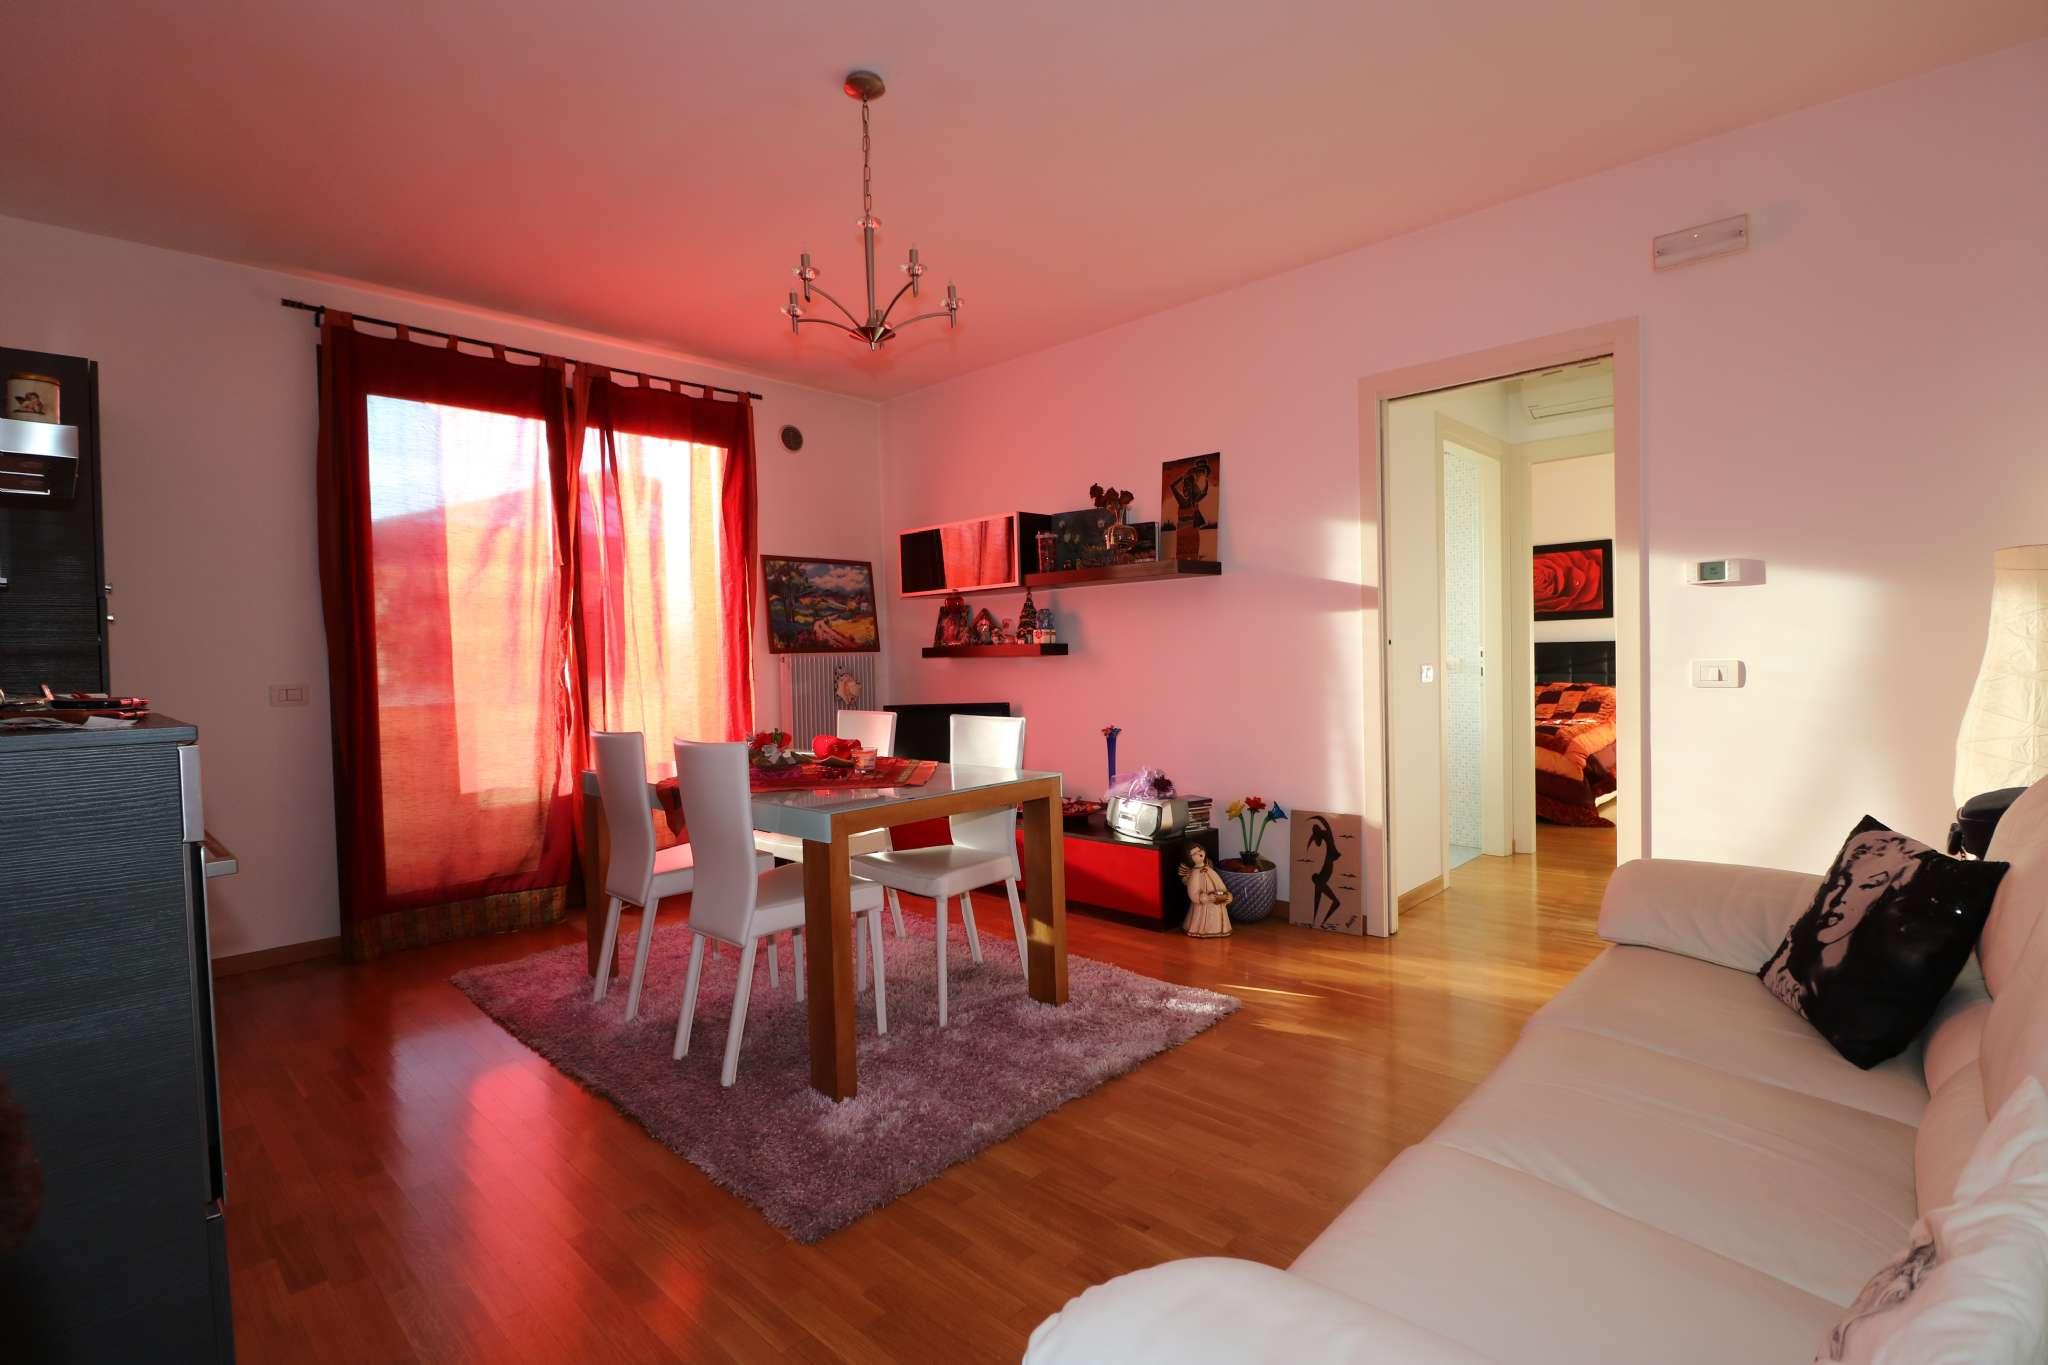 Mini Appartamento in vendita a Carbonera di 50 mq